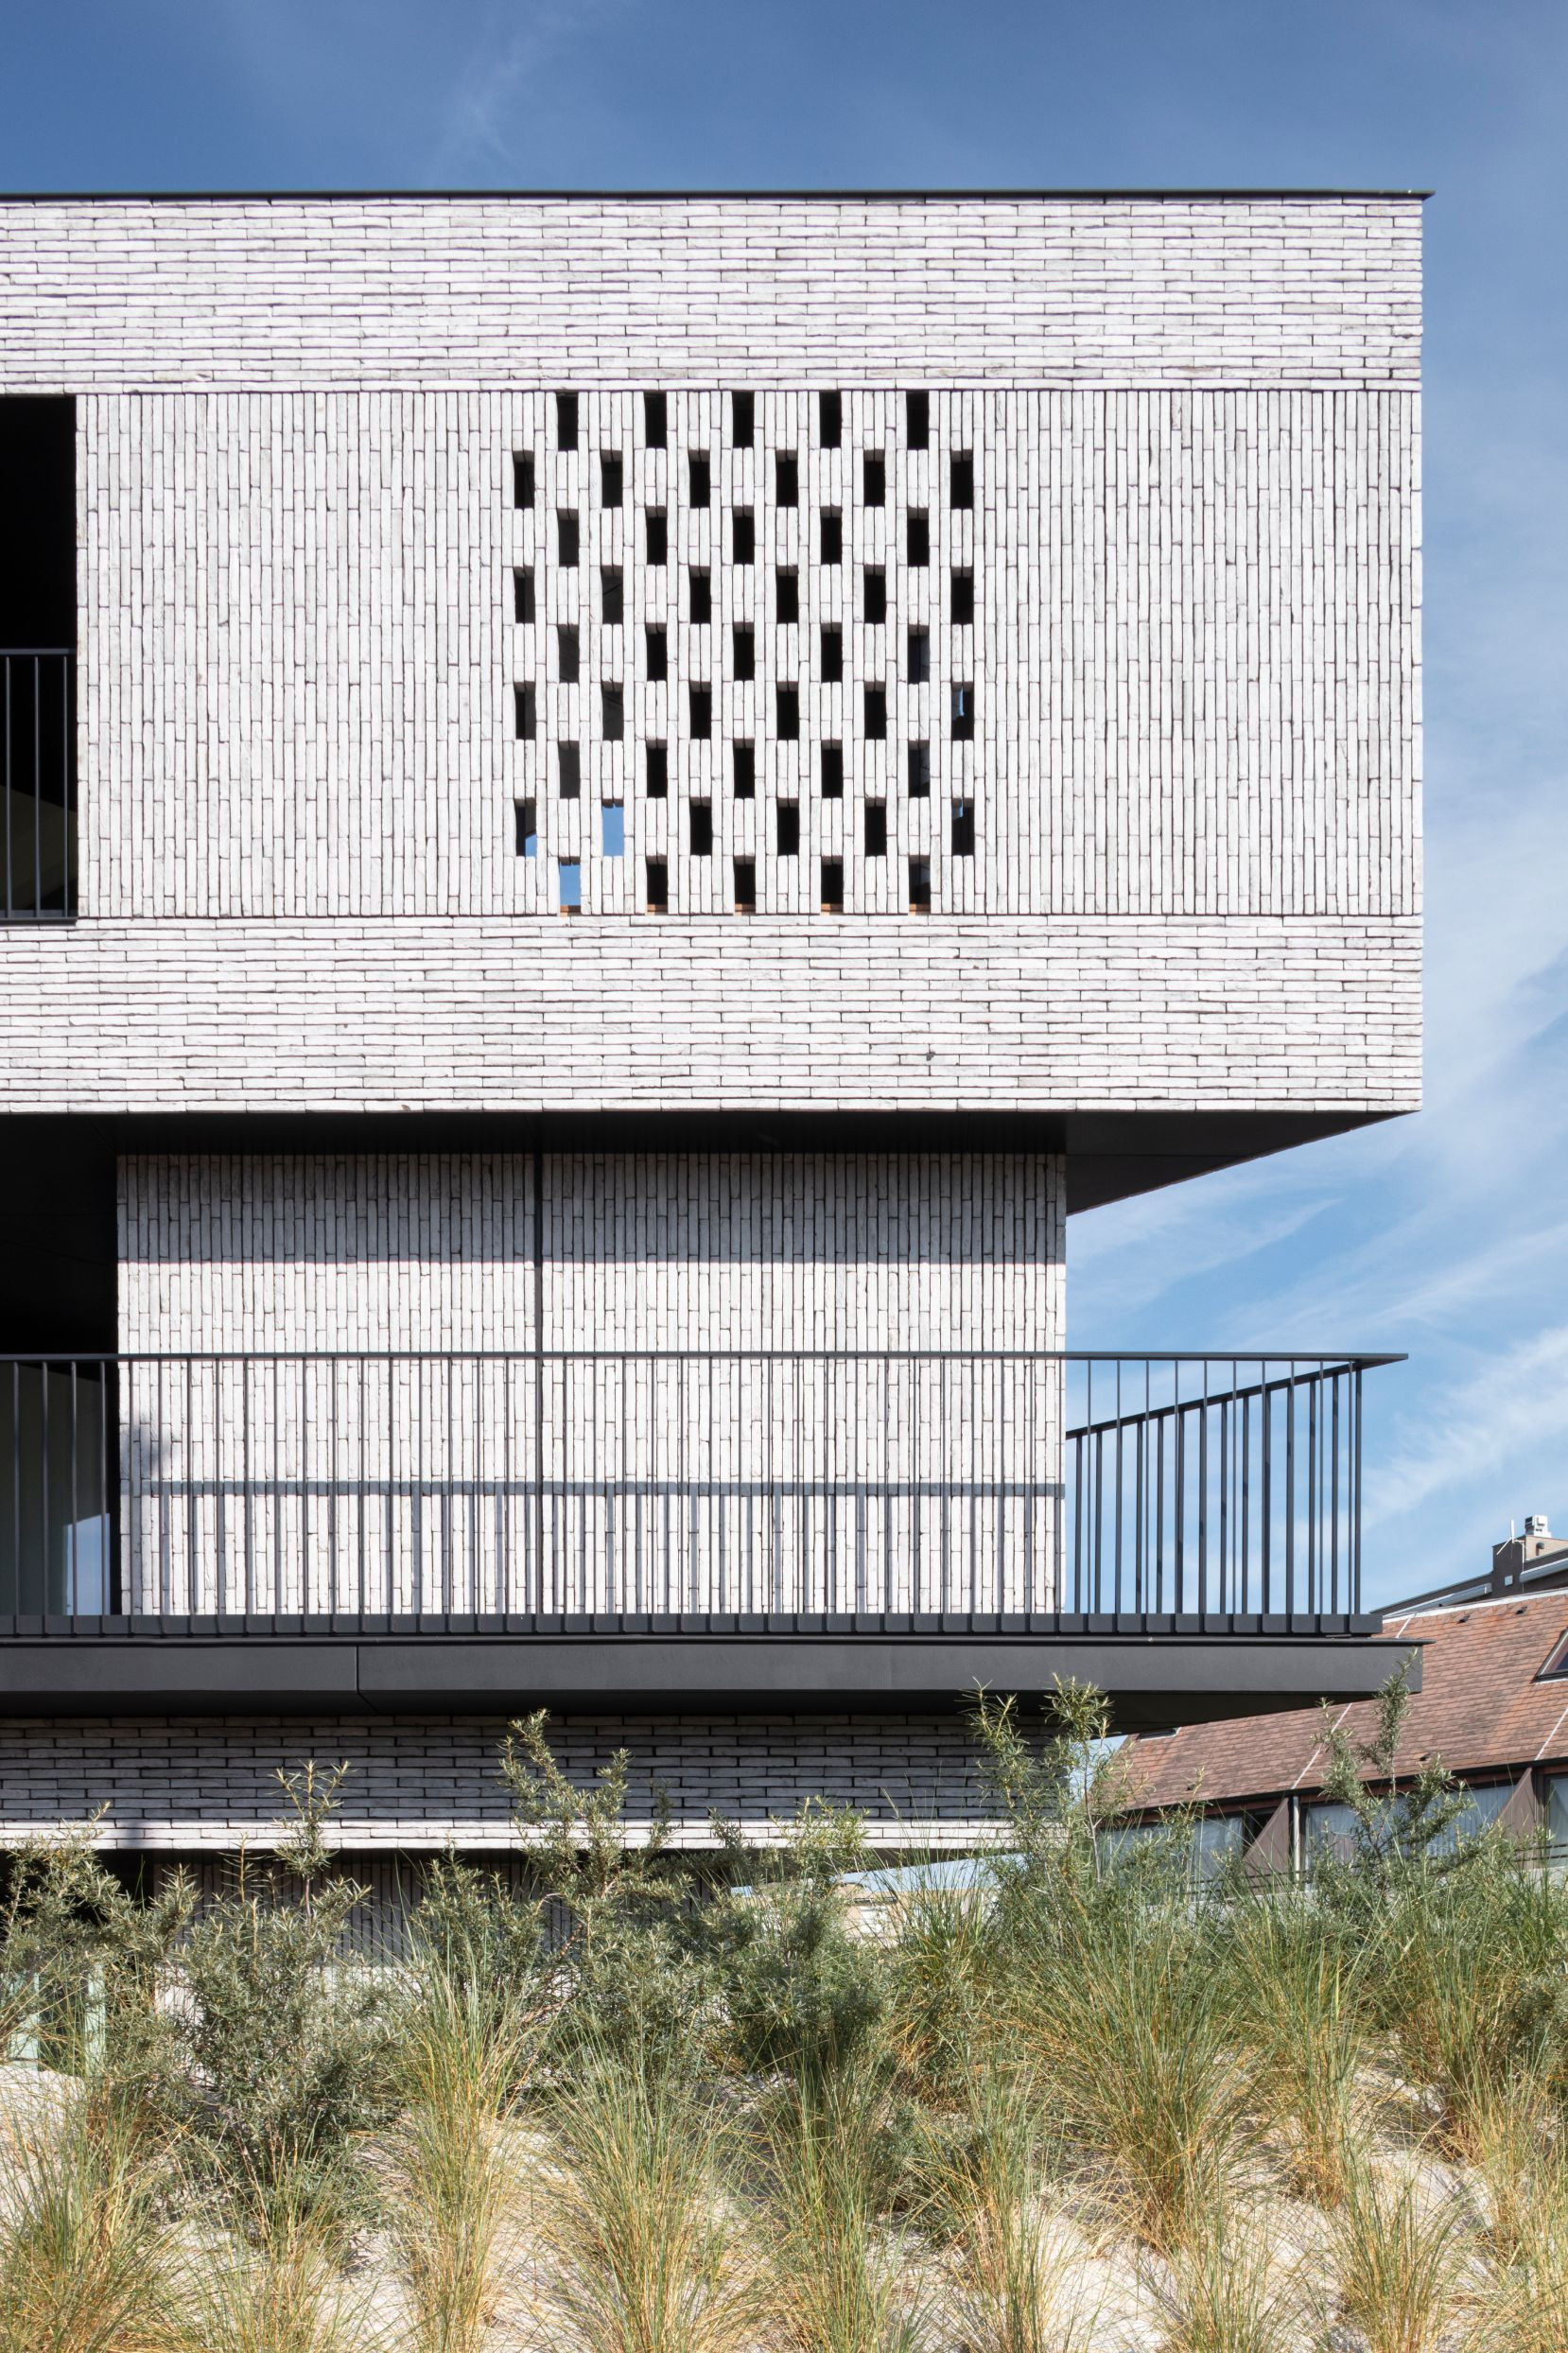 Pierre Paulin - Rietveldprojects - Sint-Idesbald - Tvdv9